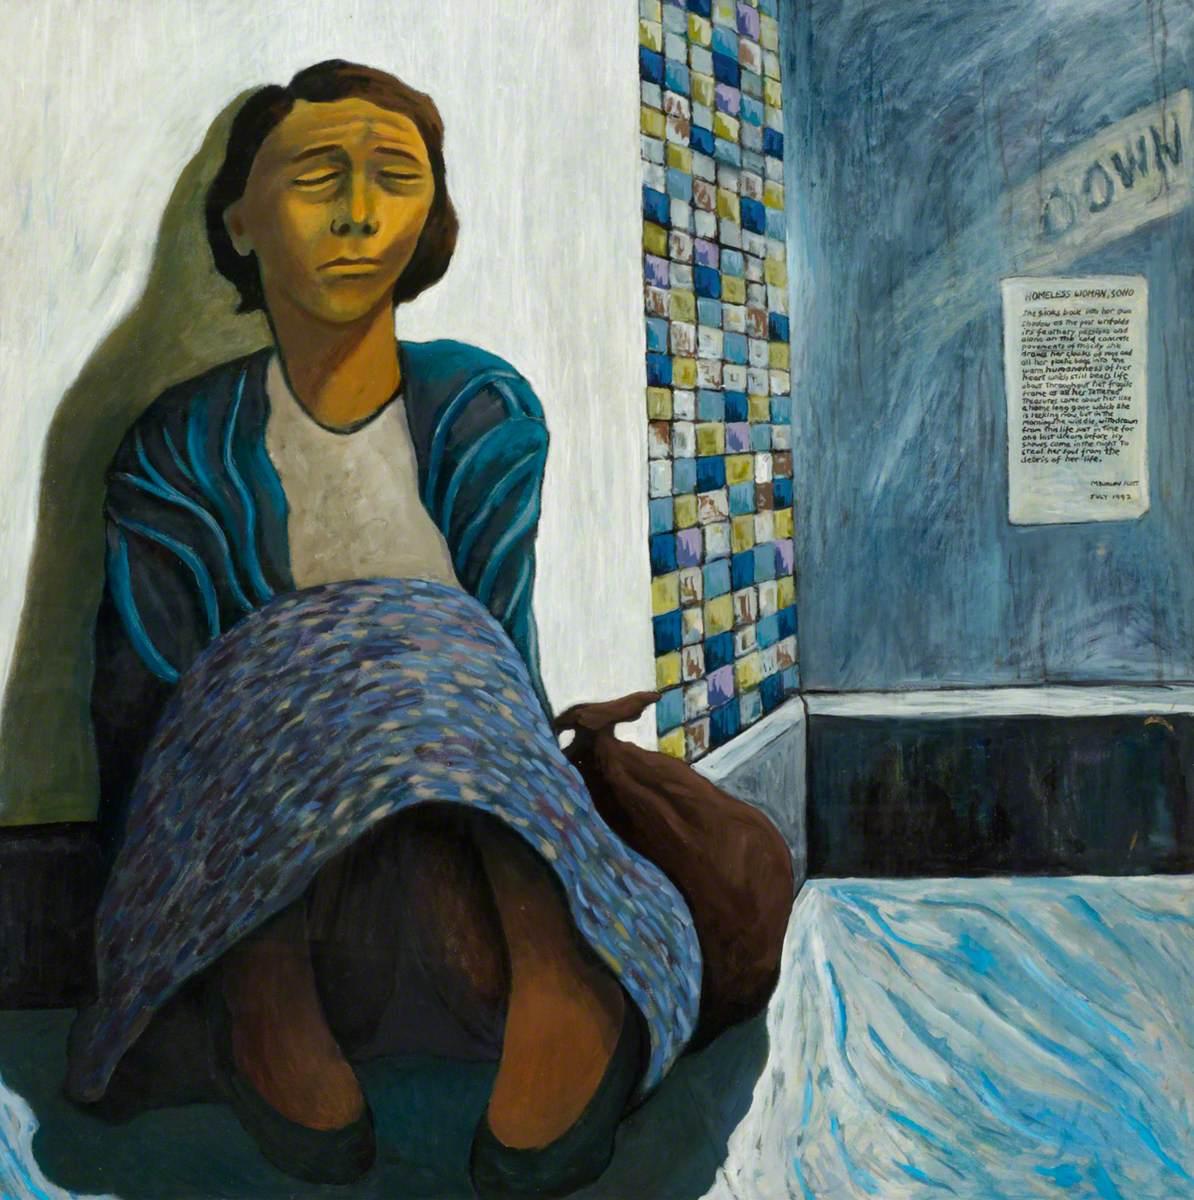 Homeless Woman, Soho